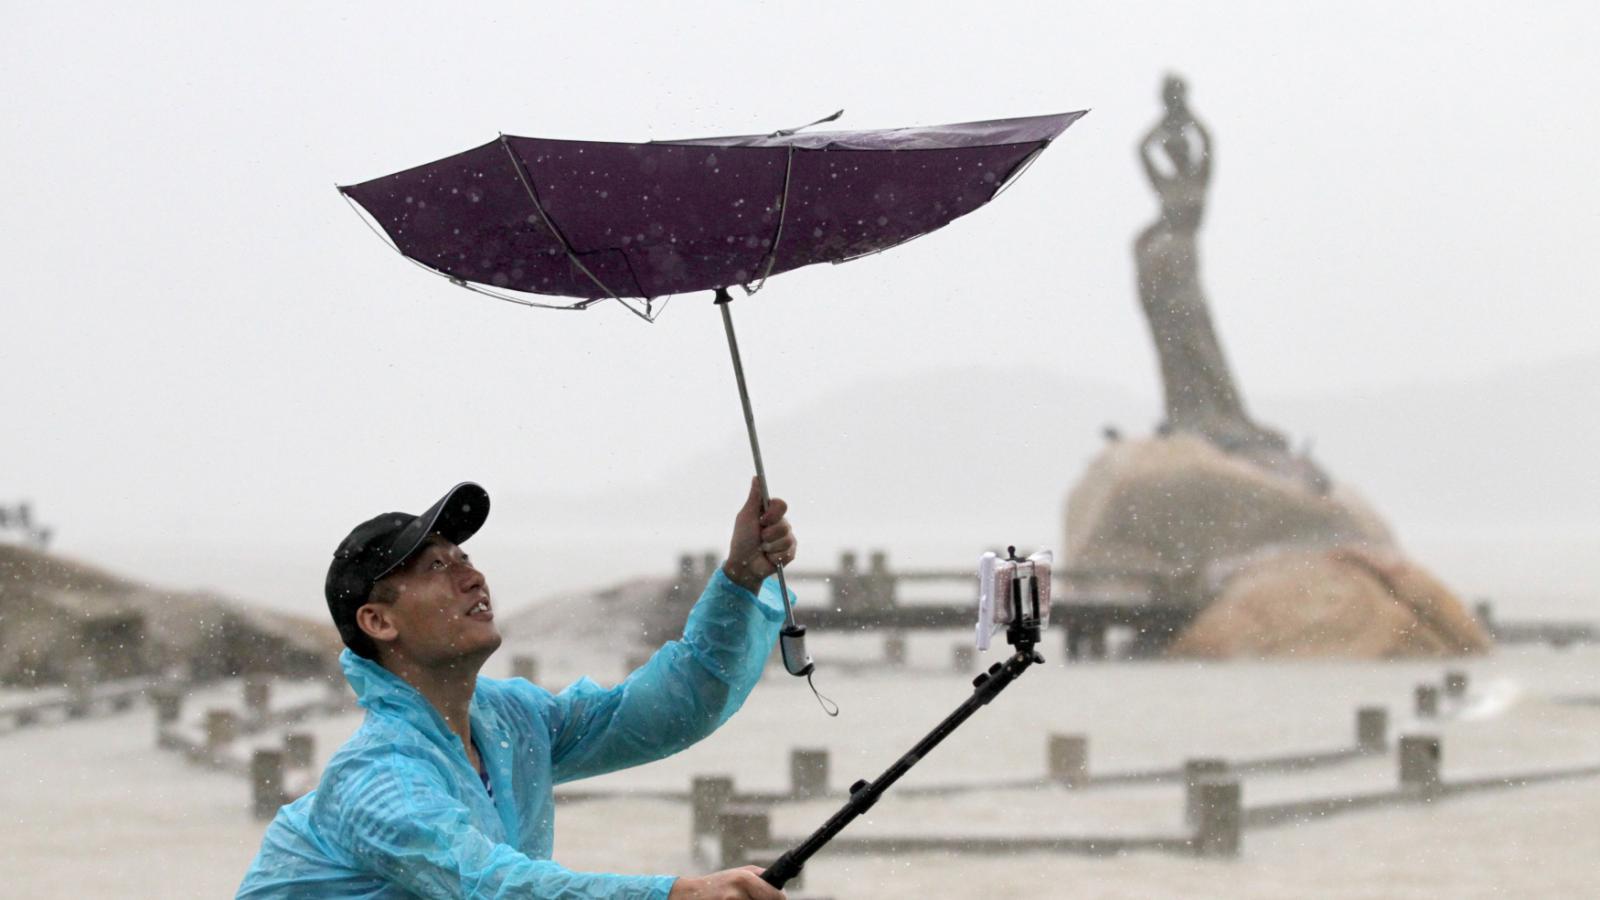 Tajfun Nida dorazil do Číny